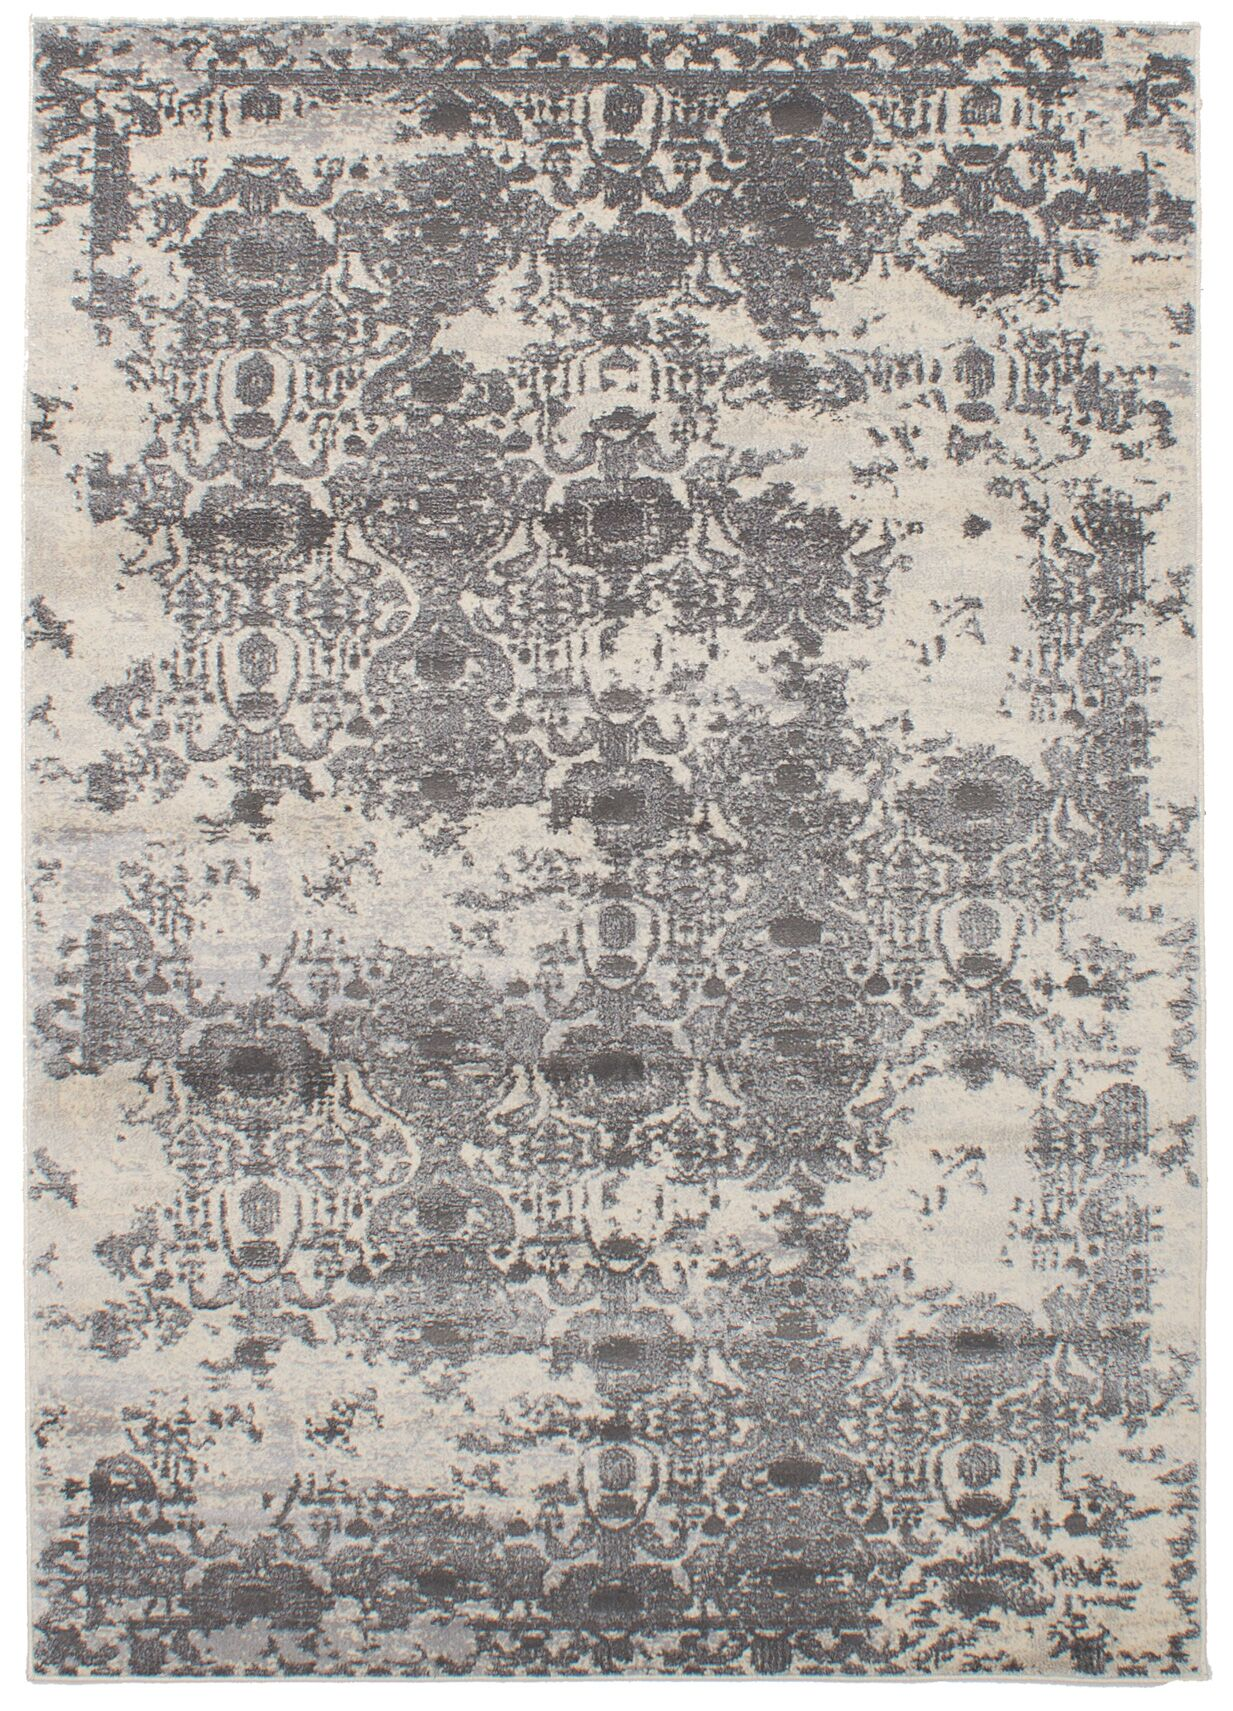 Faustine Gray Abstract Area Rug